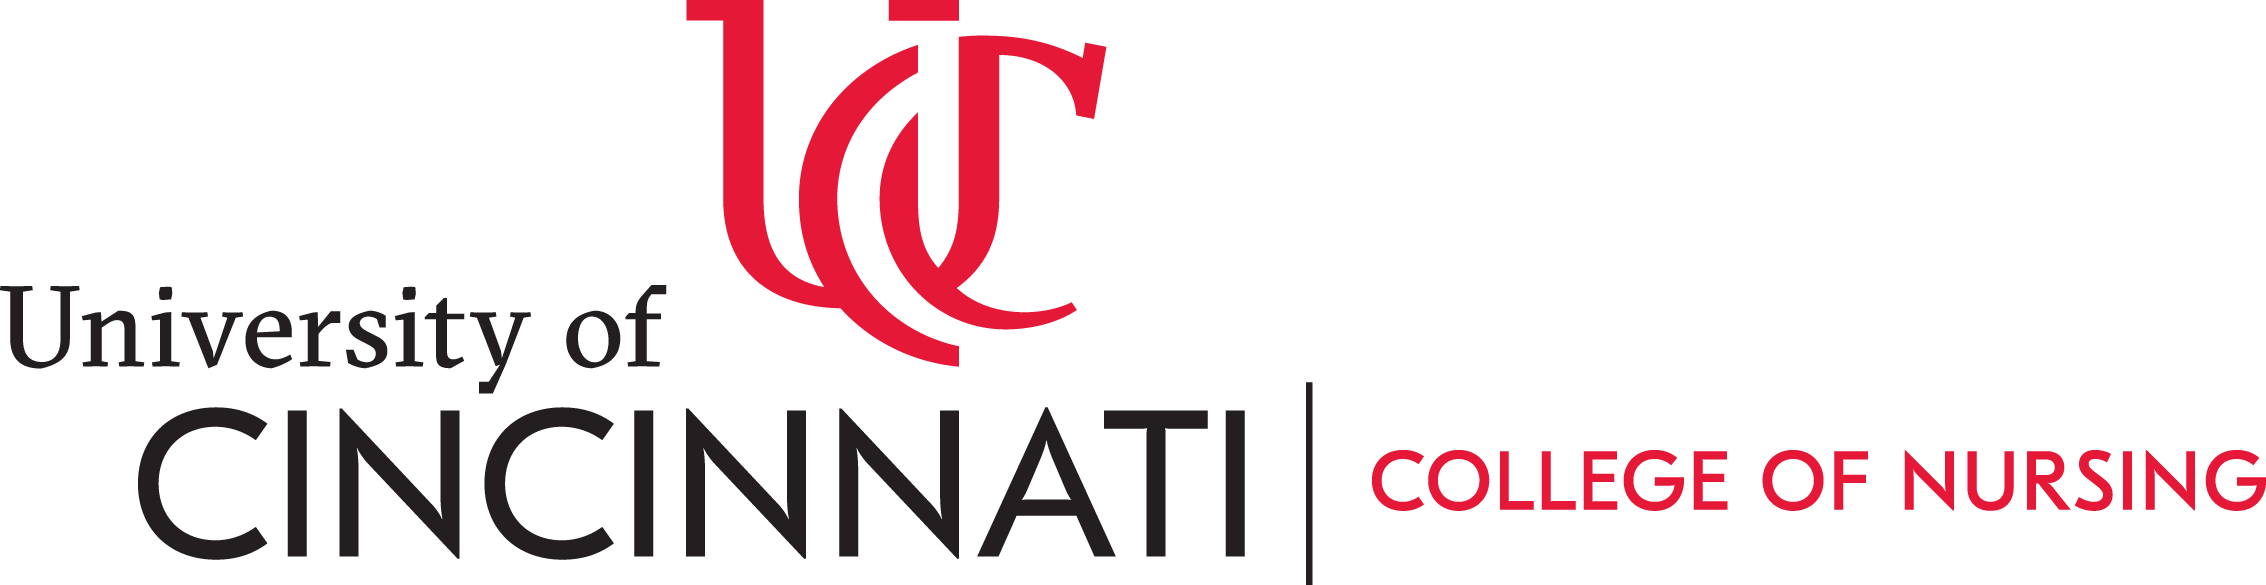 University of Cincinnati College of Nursing